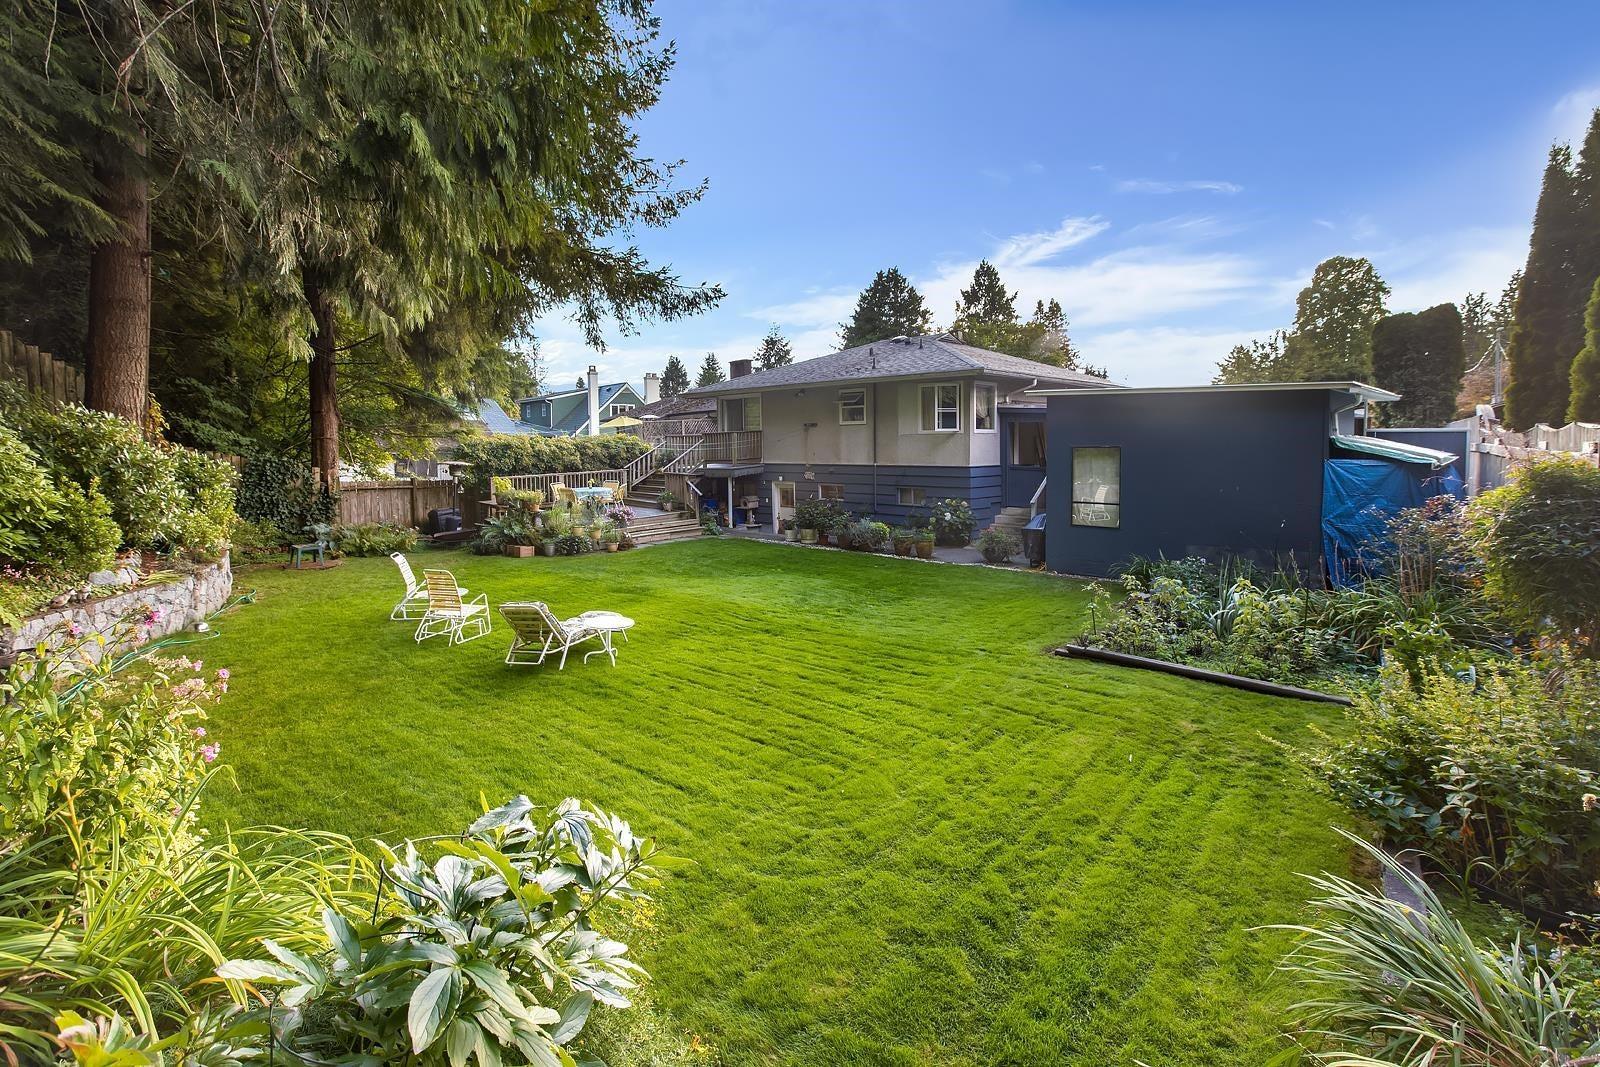 3495 WELLINGTON CRESCENT - Edgemont House/Single Family for sale, 3 Bedrooms (R2617949) - #11